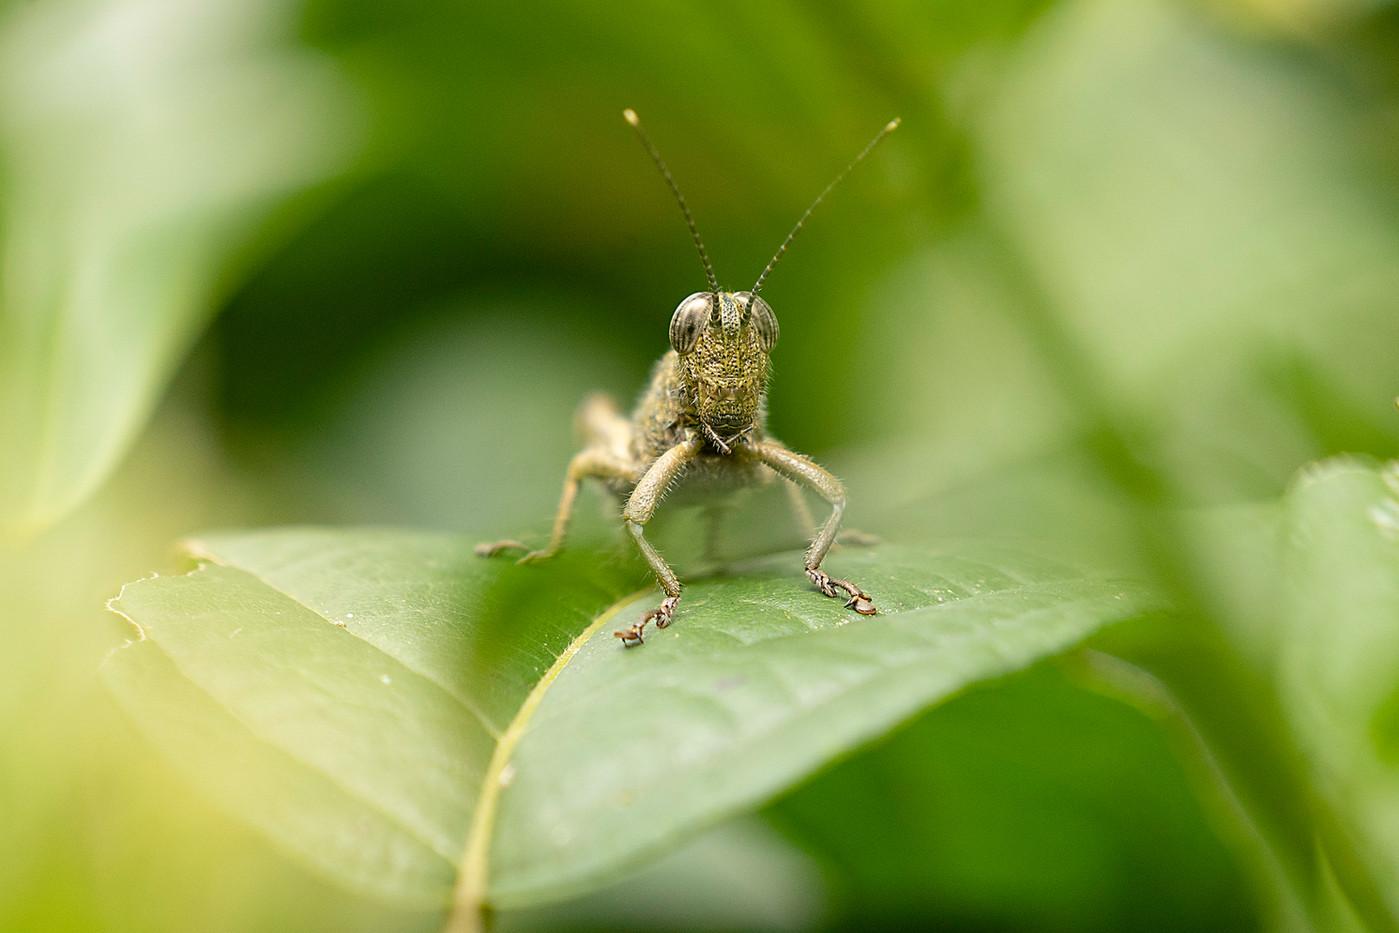 Grasshopper in Arusha, Tanzania